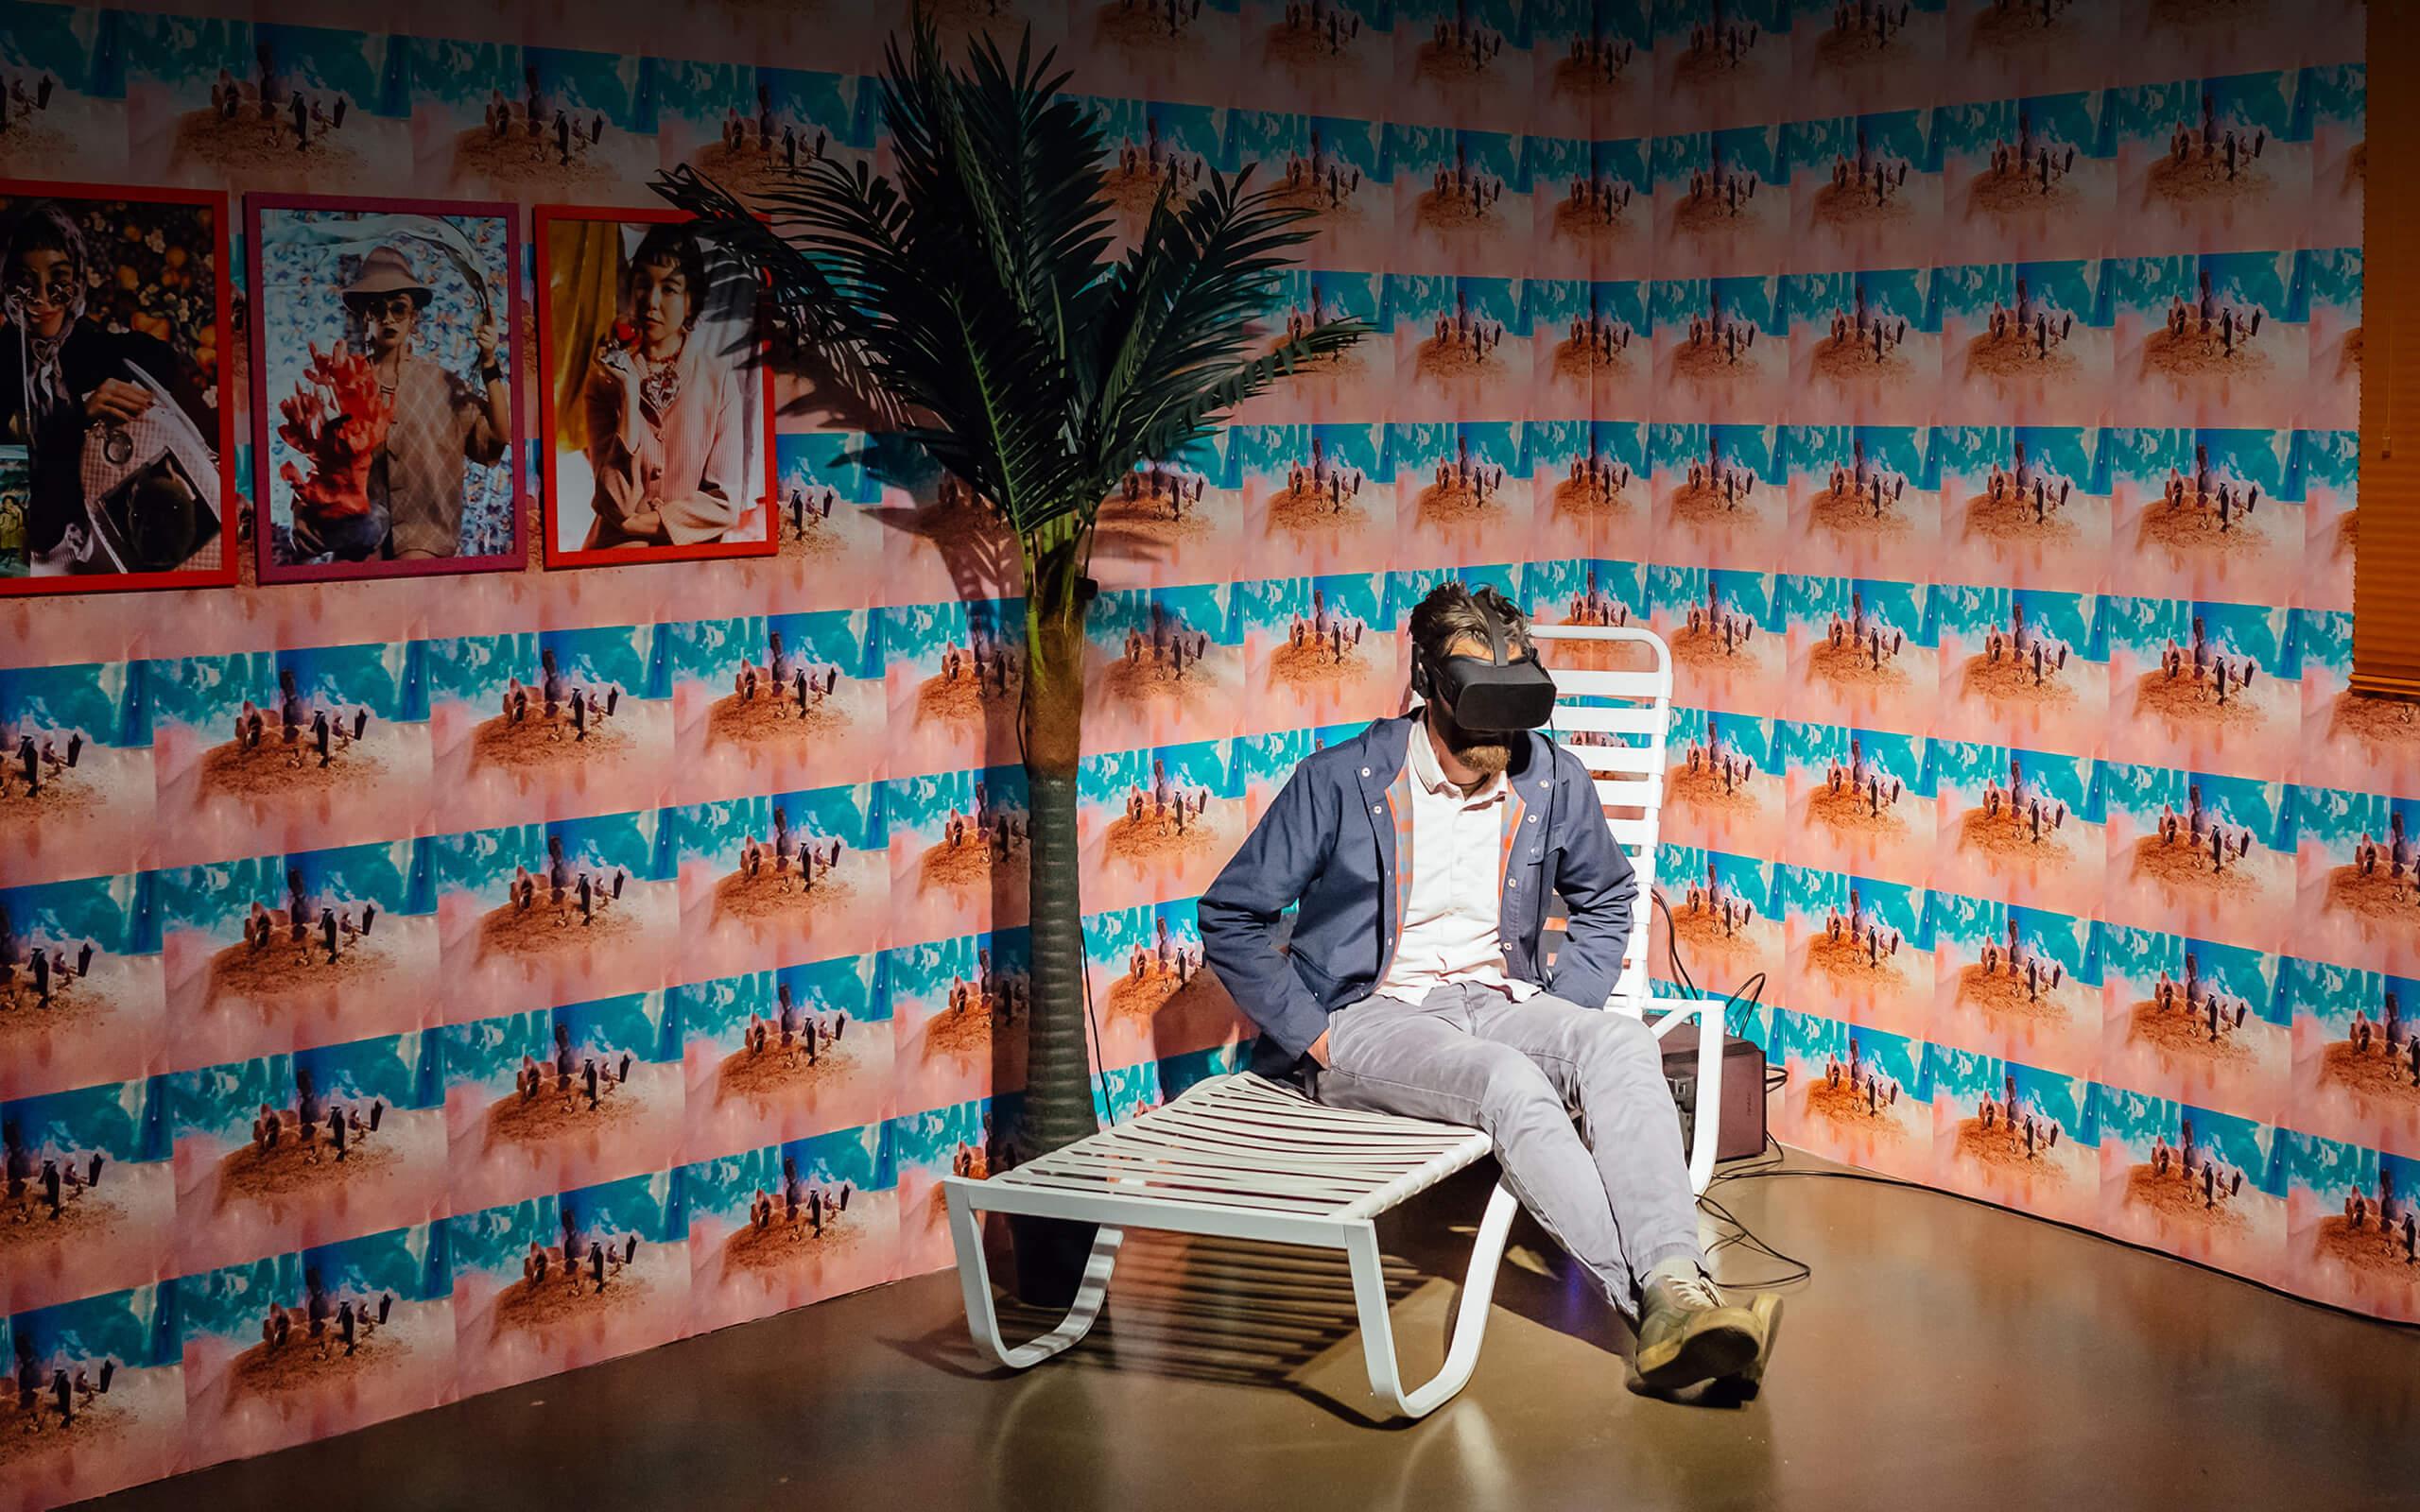 an art installation using virtual reality